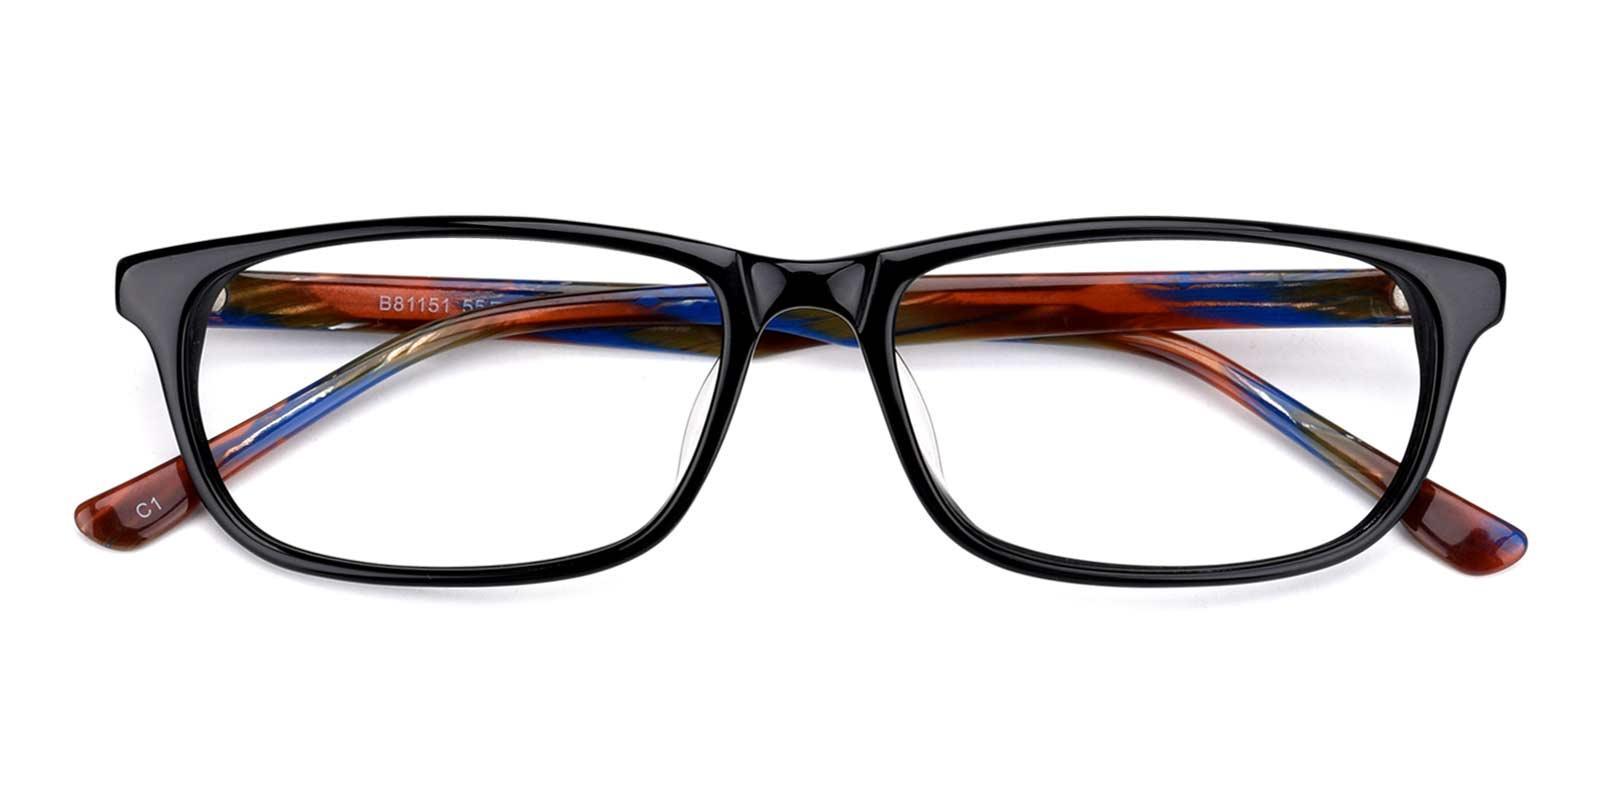 Equator-Black-Rectangle-Acetate-Eyeglasses-detail